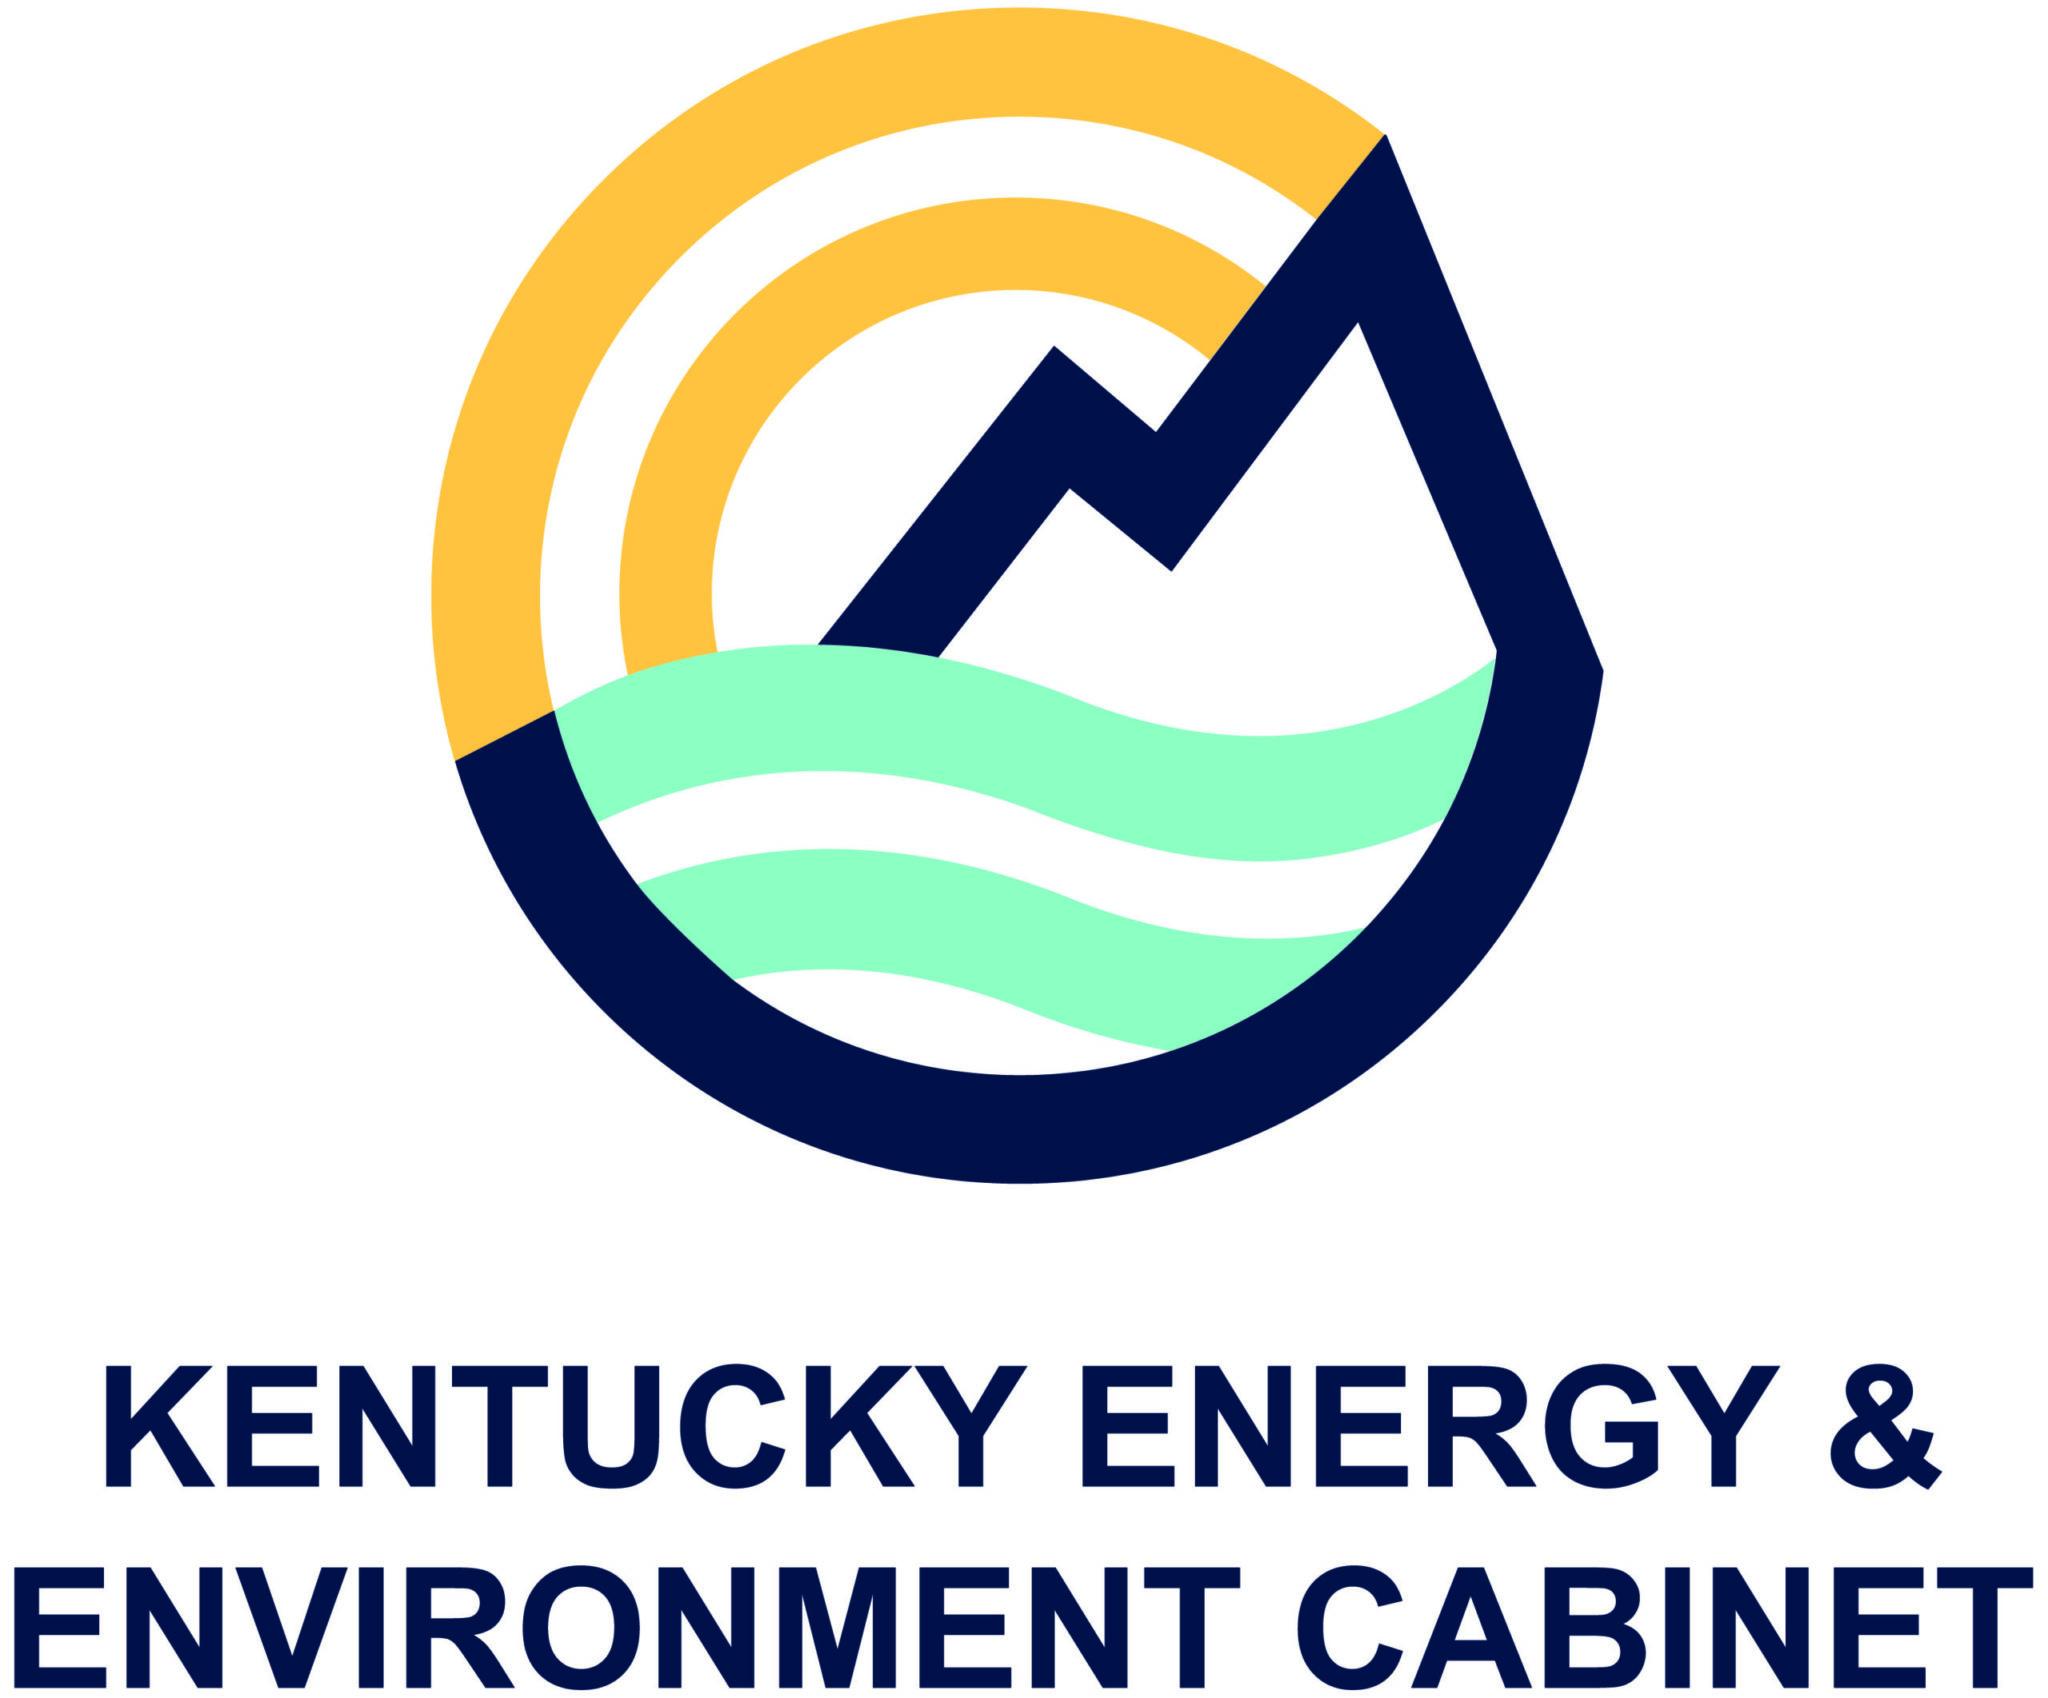 Kentucky Energy & Environment Cabinet